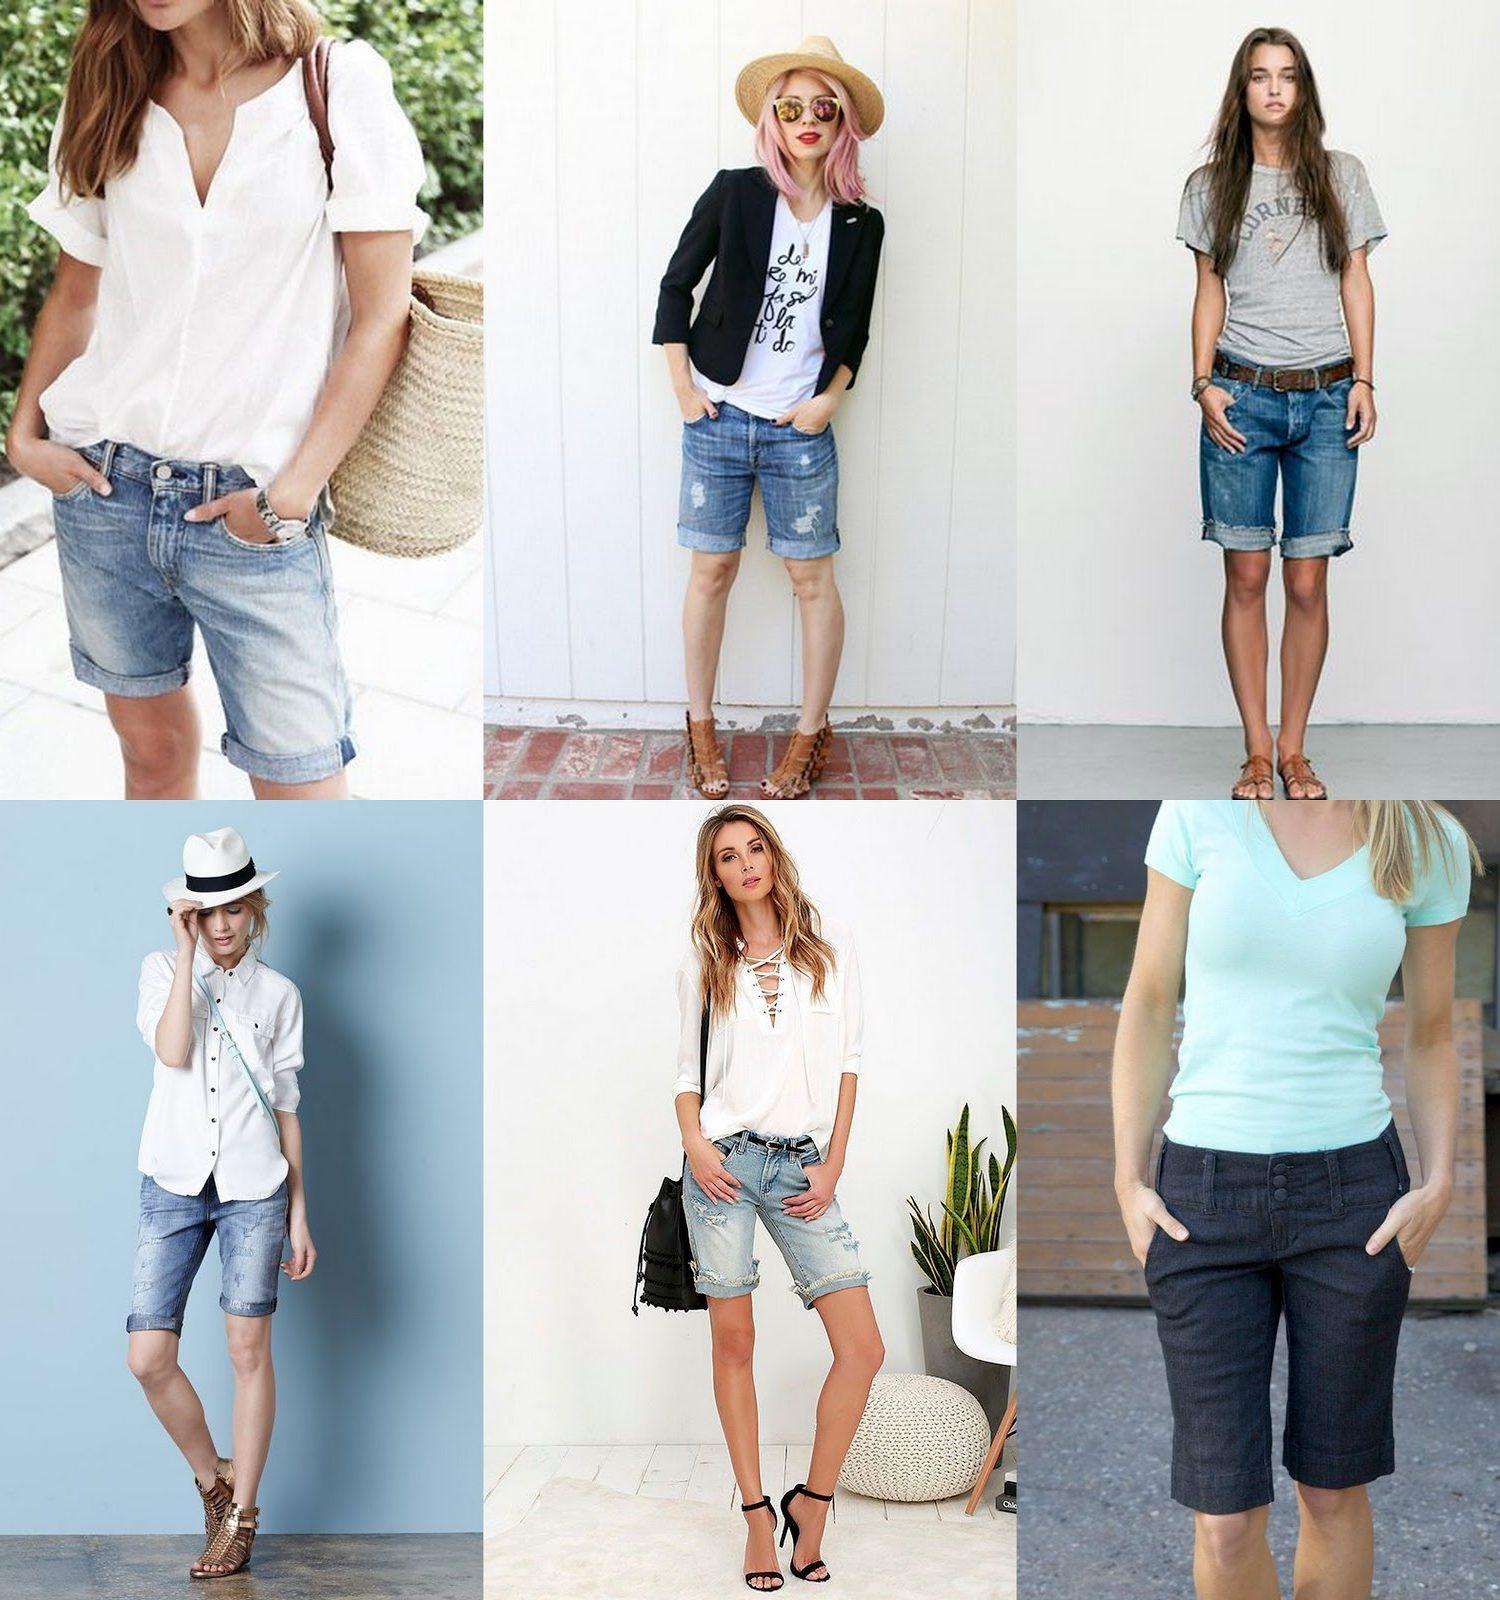 boyfriend bermuda shorts outfit ideas